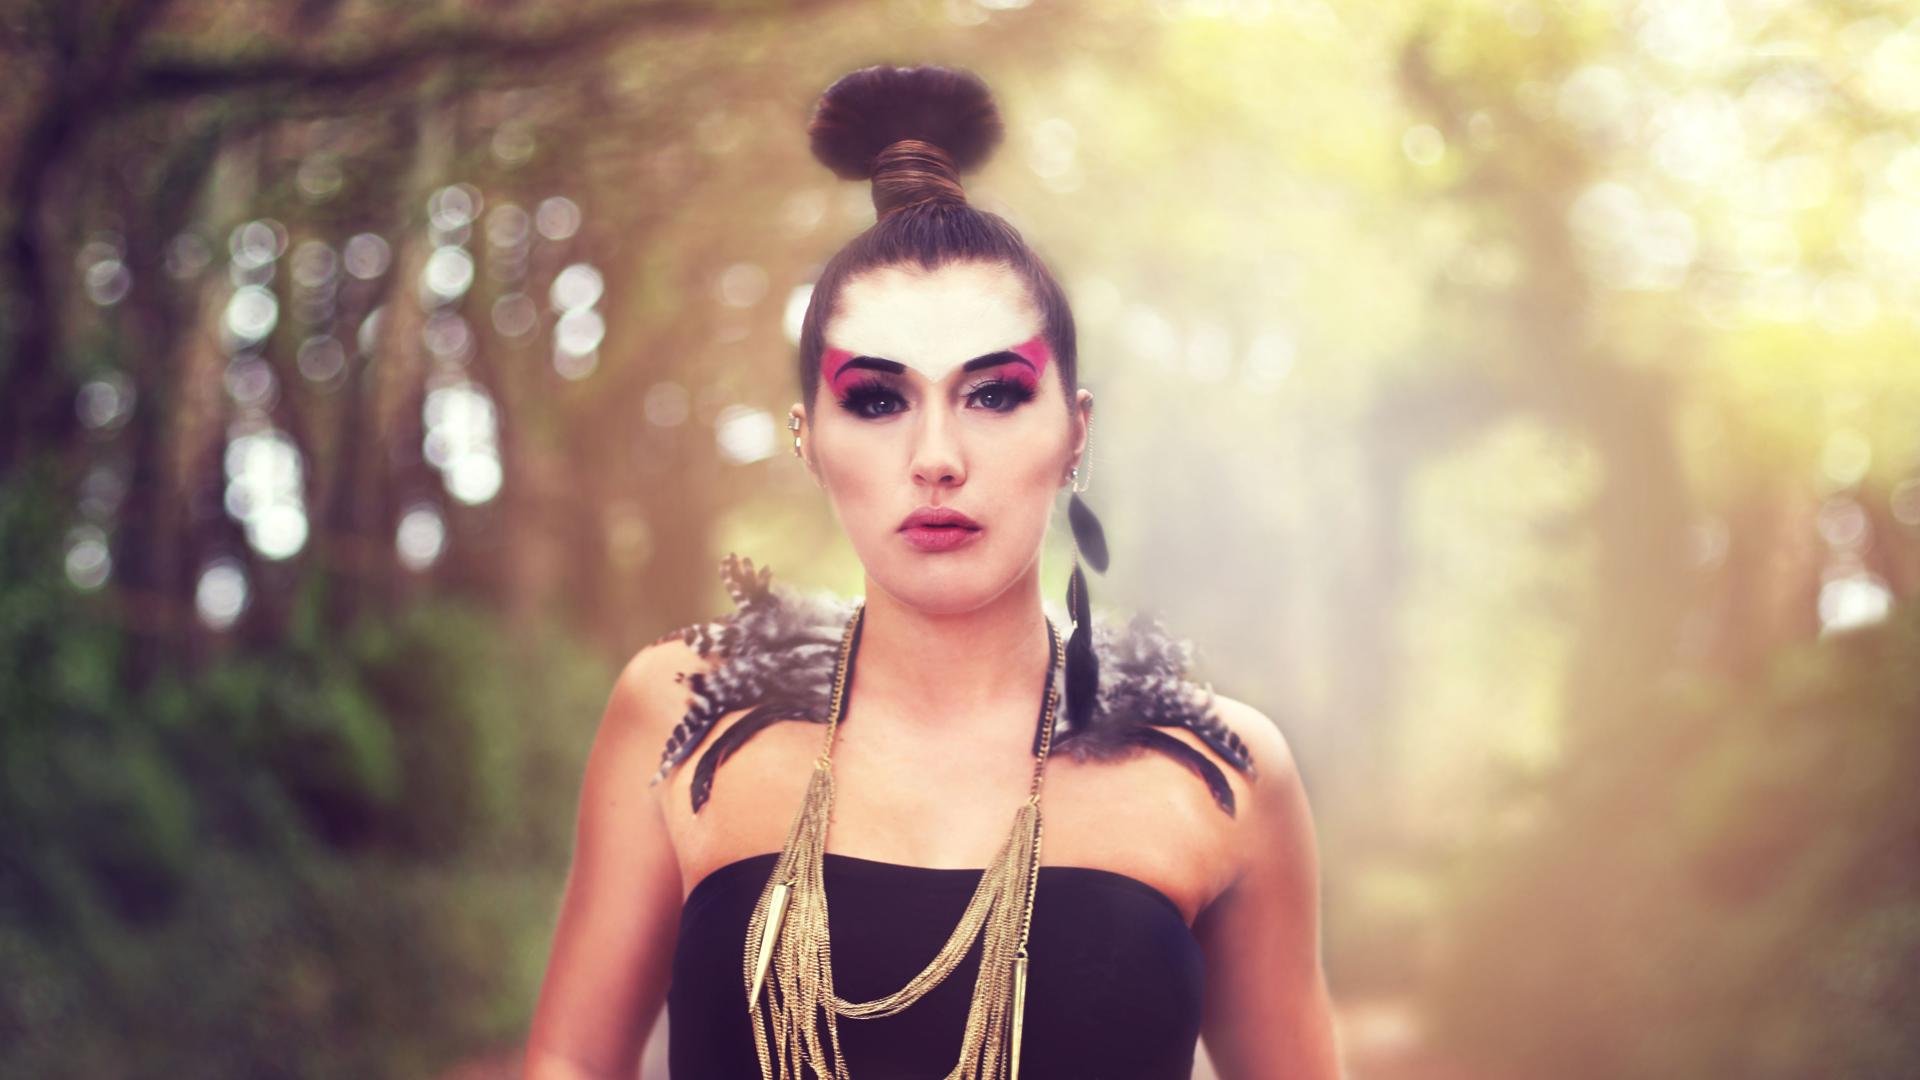 Tribal Photo Shoot - Fierce